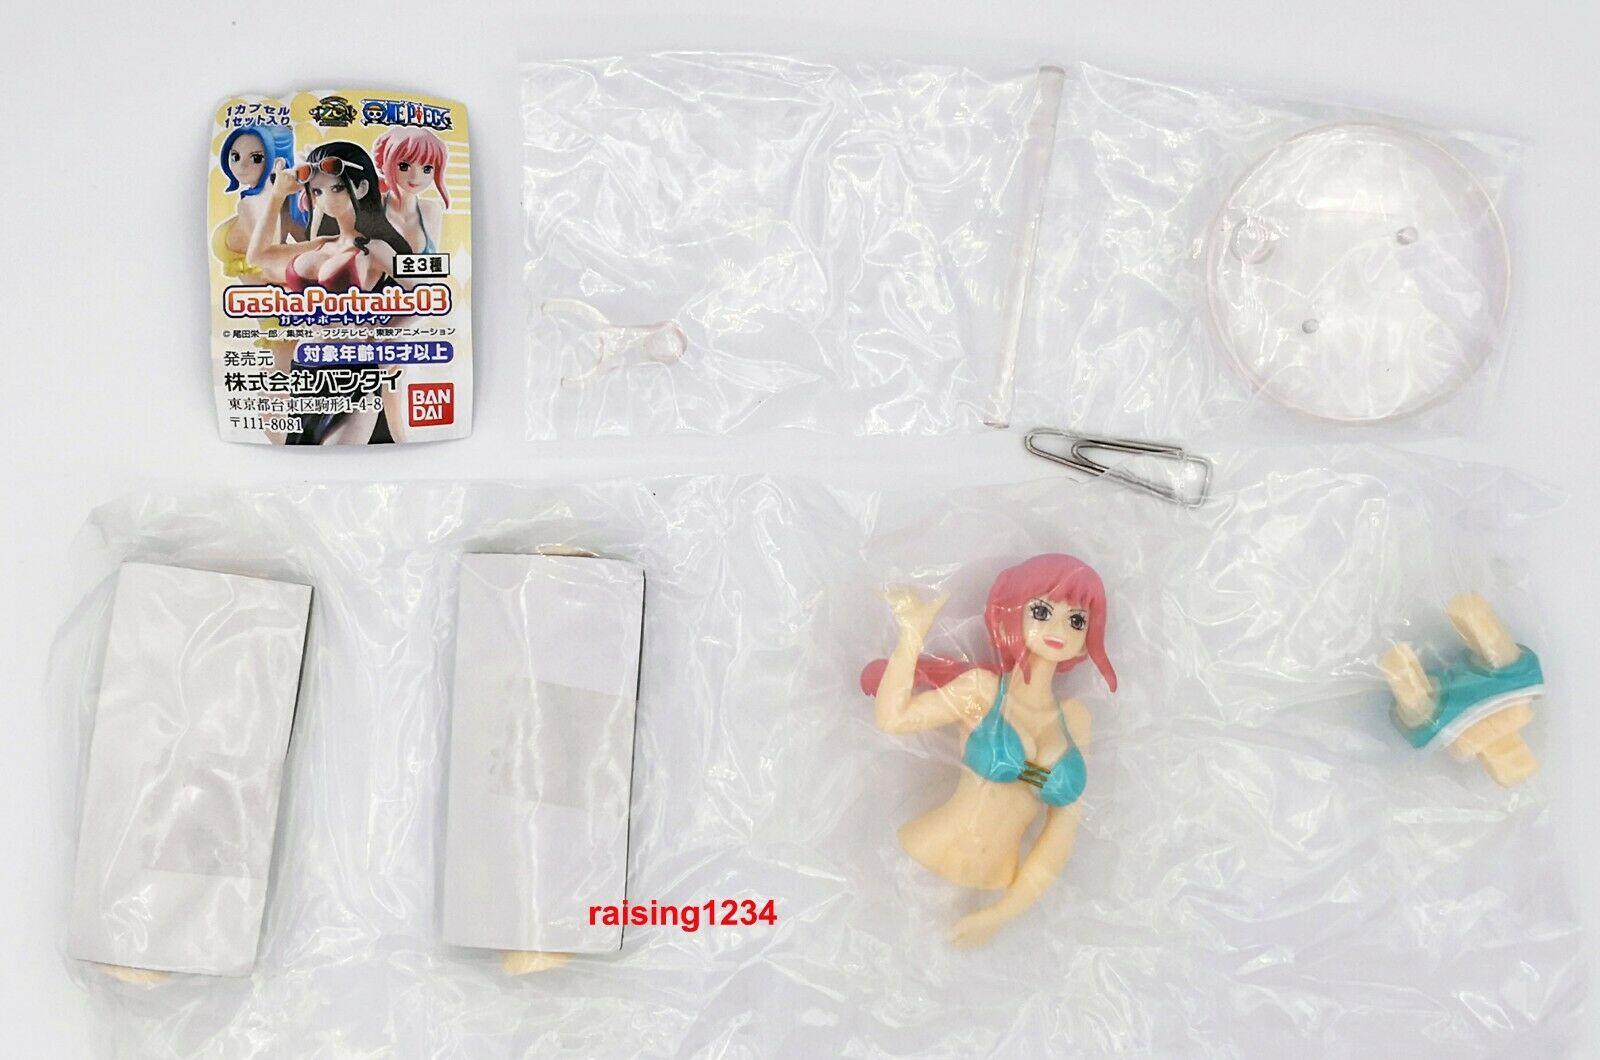 Bandai One Piece Anime Figure Gasha Portraits 3 Robin Rebecca Vivi set 3 pcs